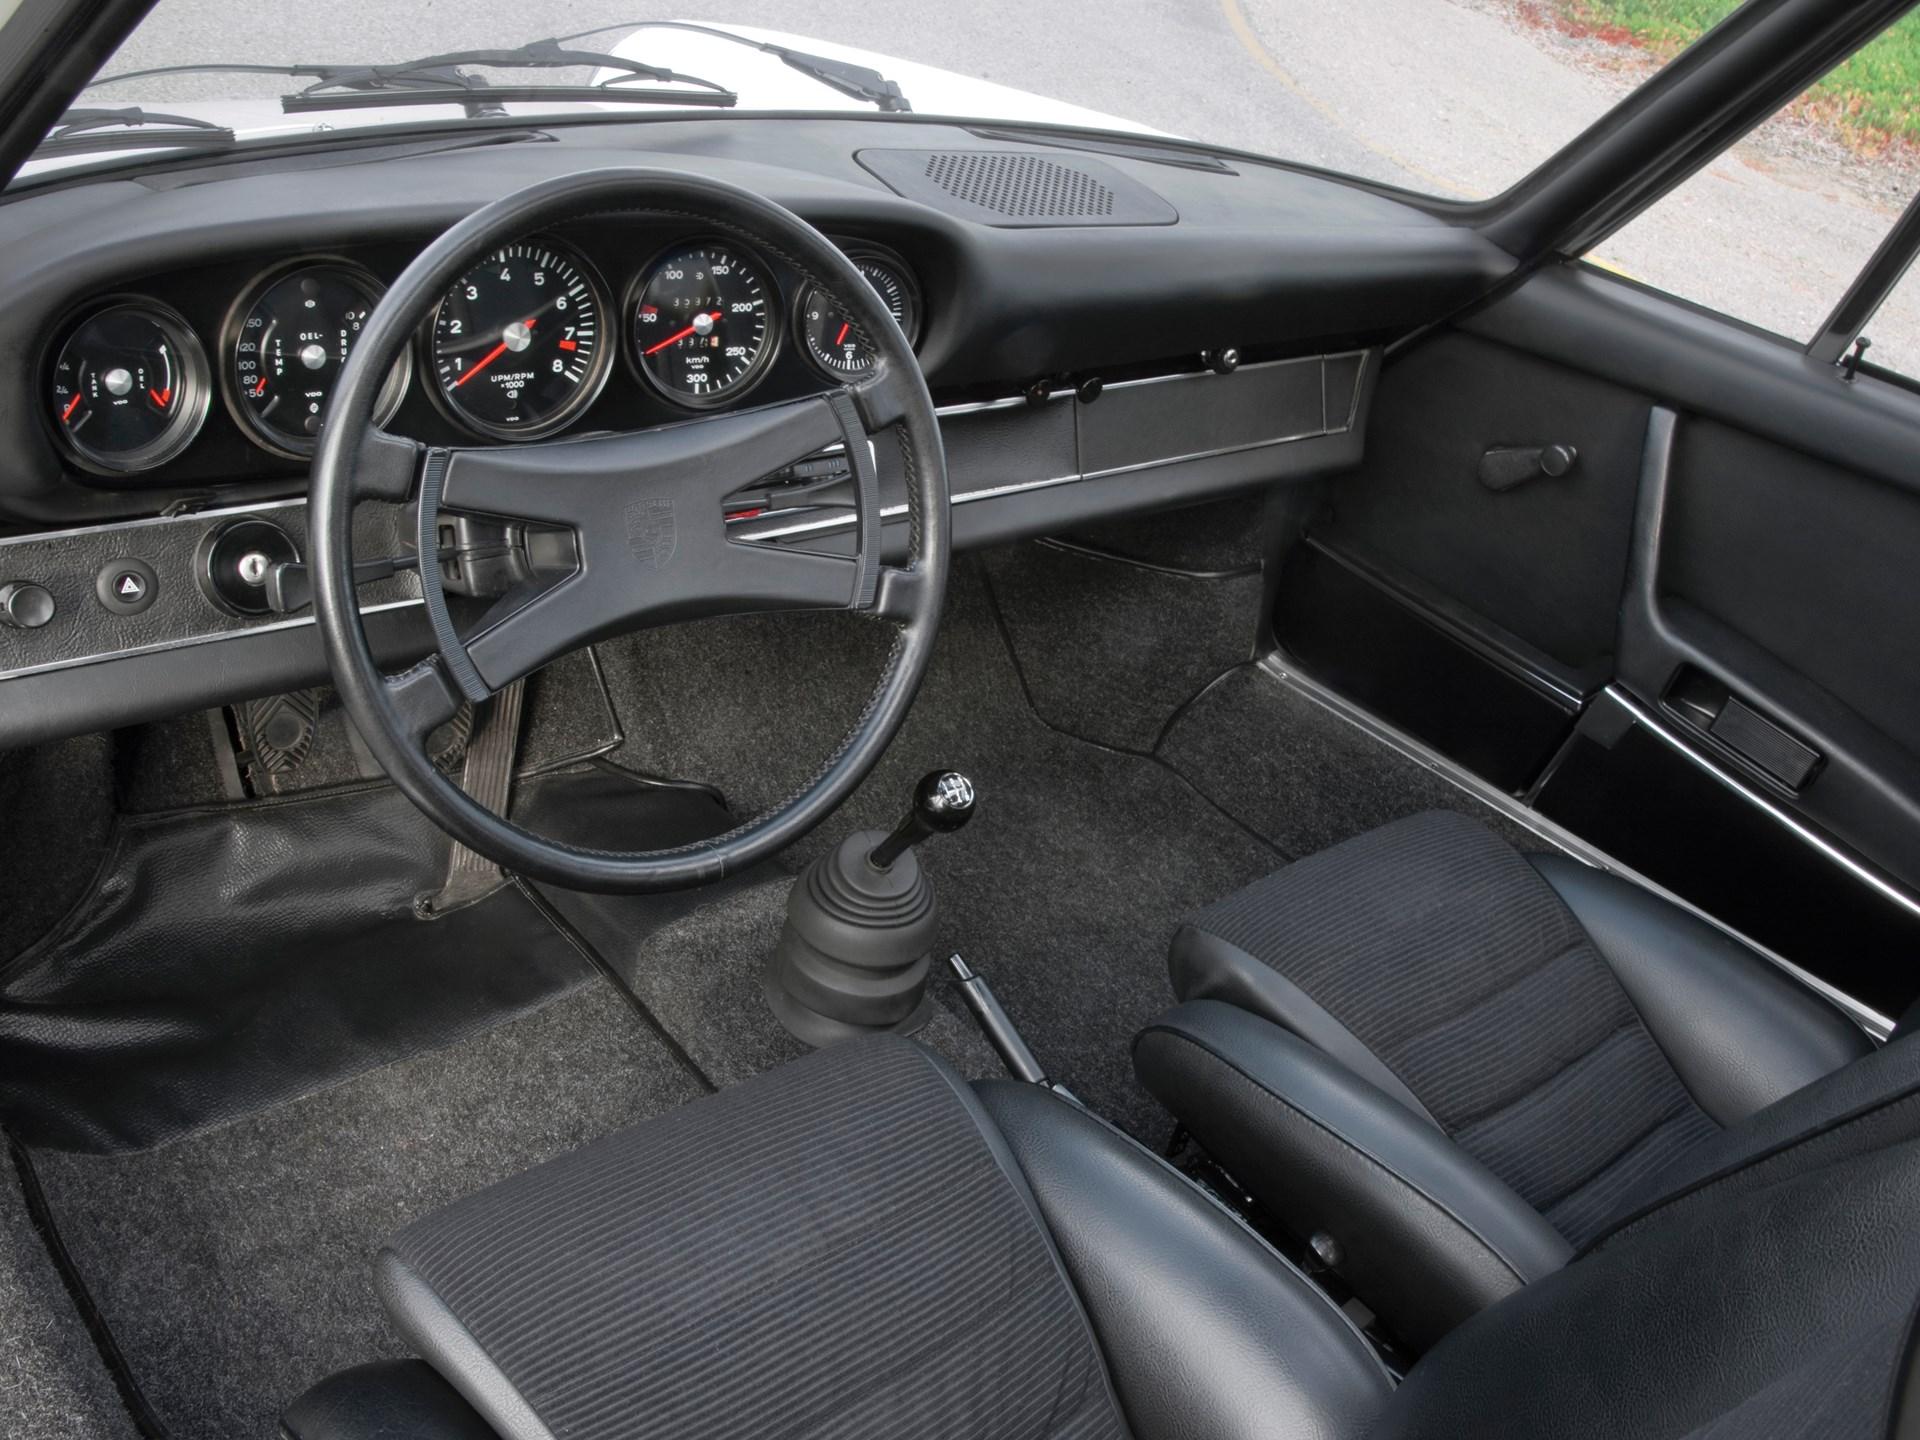 1973 Porsche 911 Carrera RS (Factory Remanufactured Special)